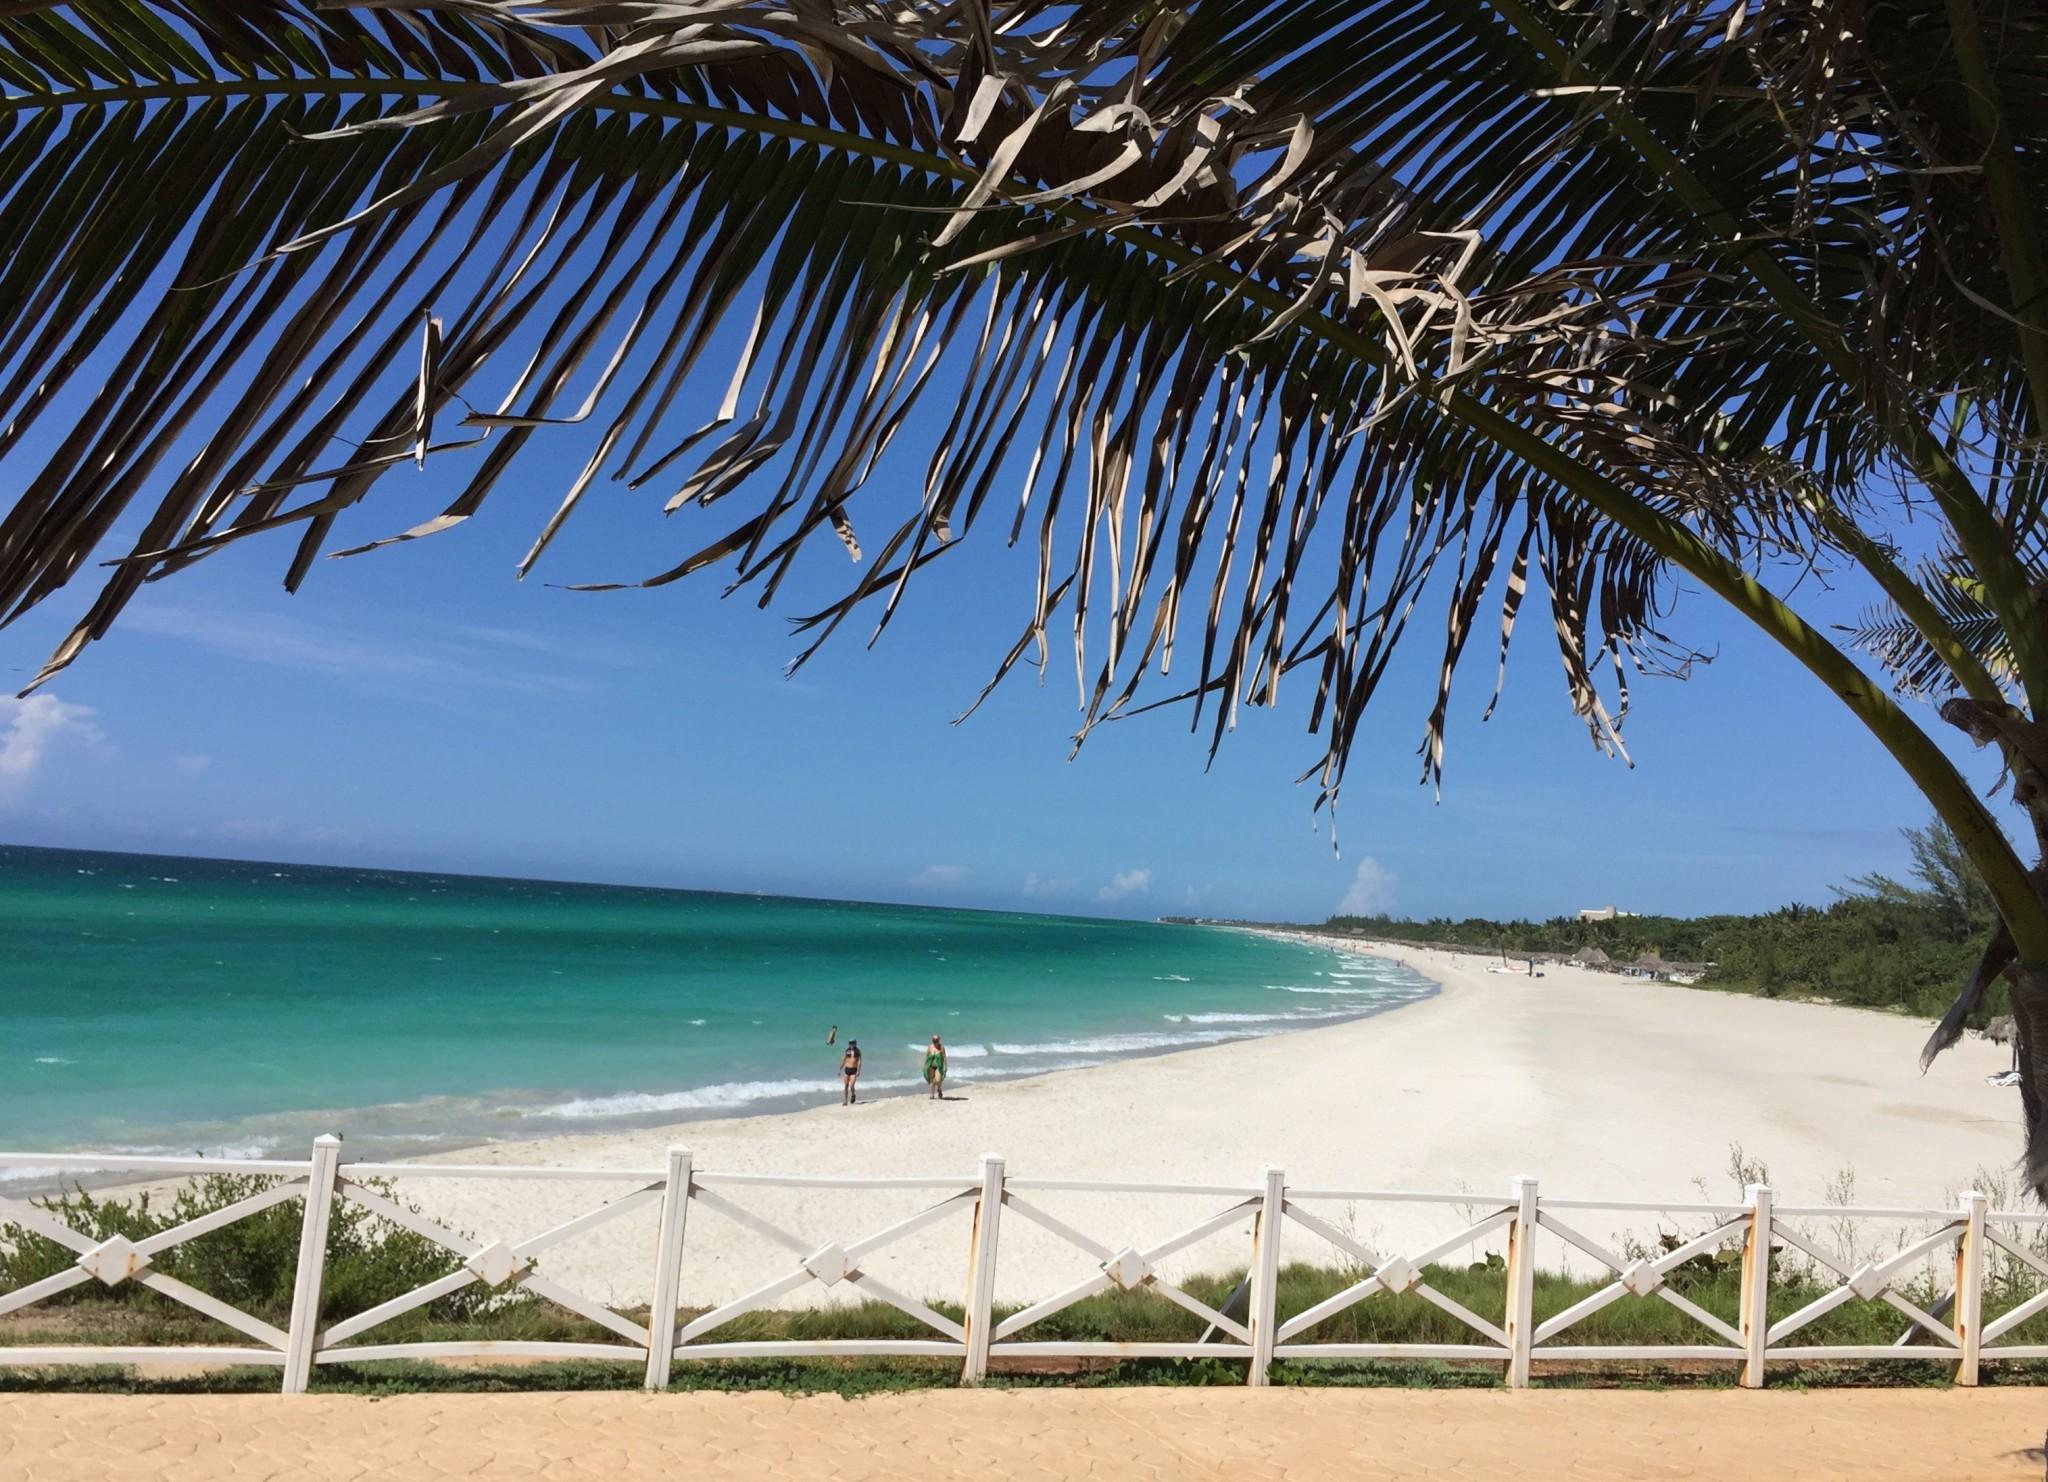 Kuba - Strand Varadero